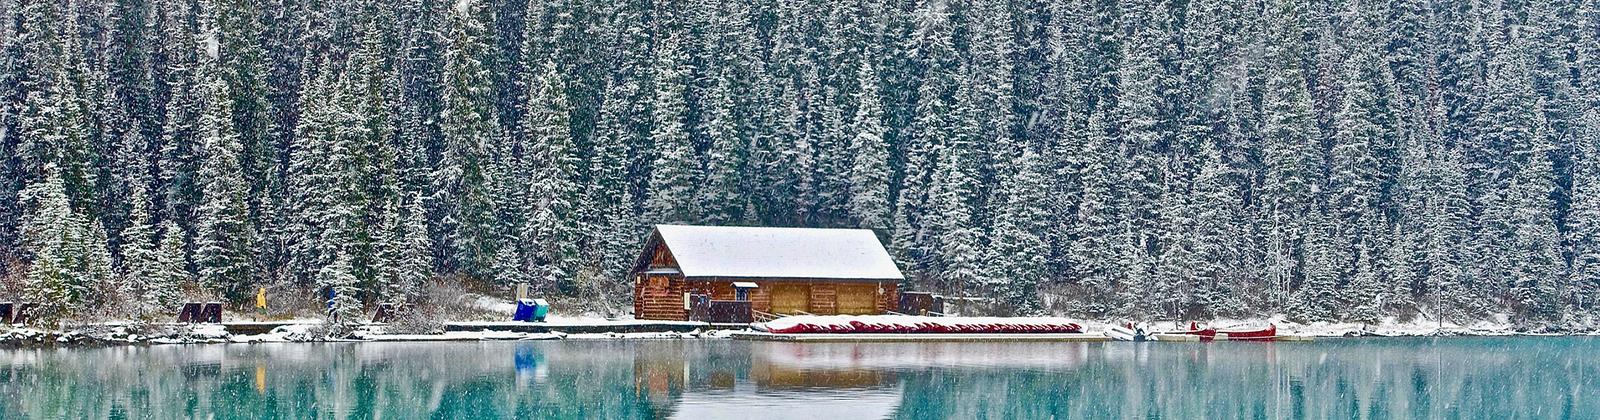 December 2018 Best Winter Holiday Destinations Around The World Skyscanner India